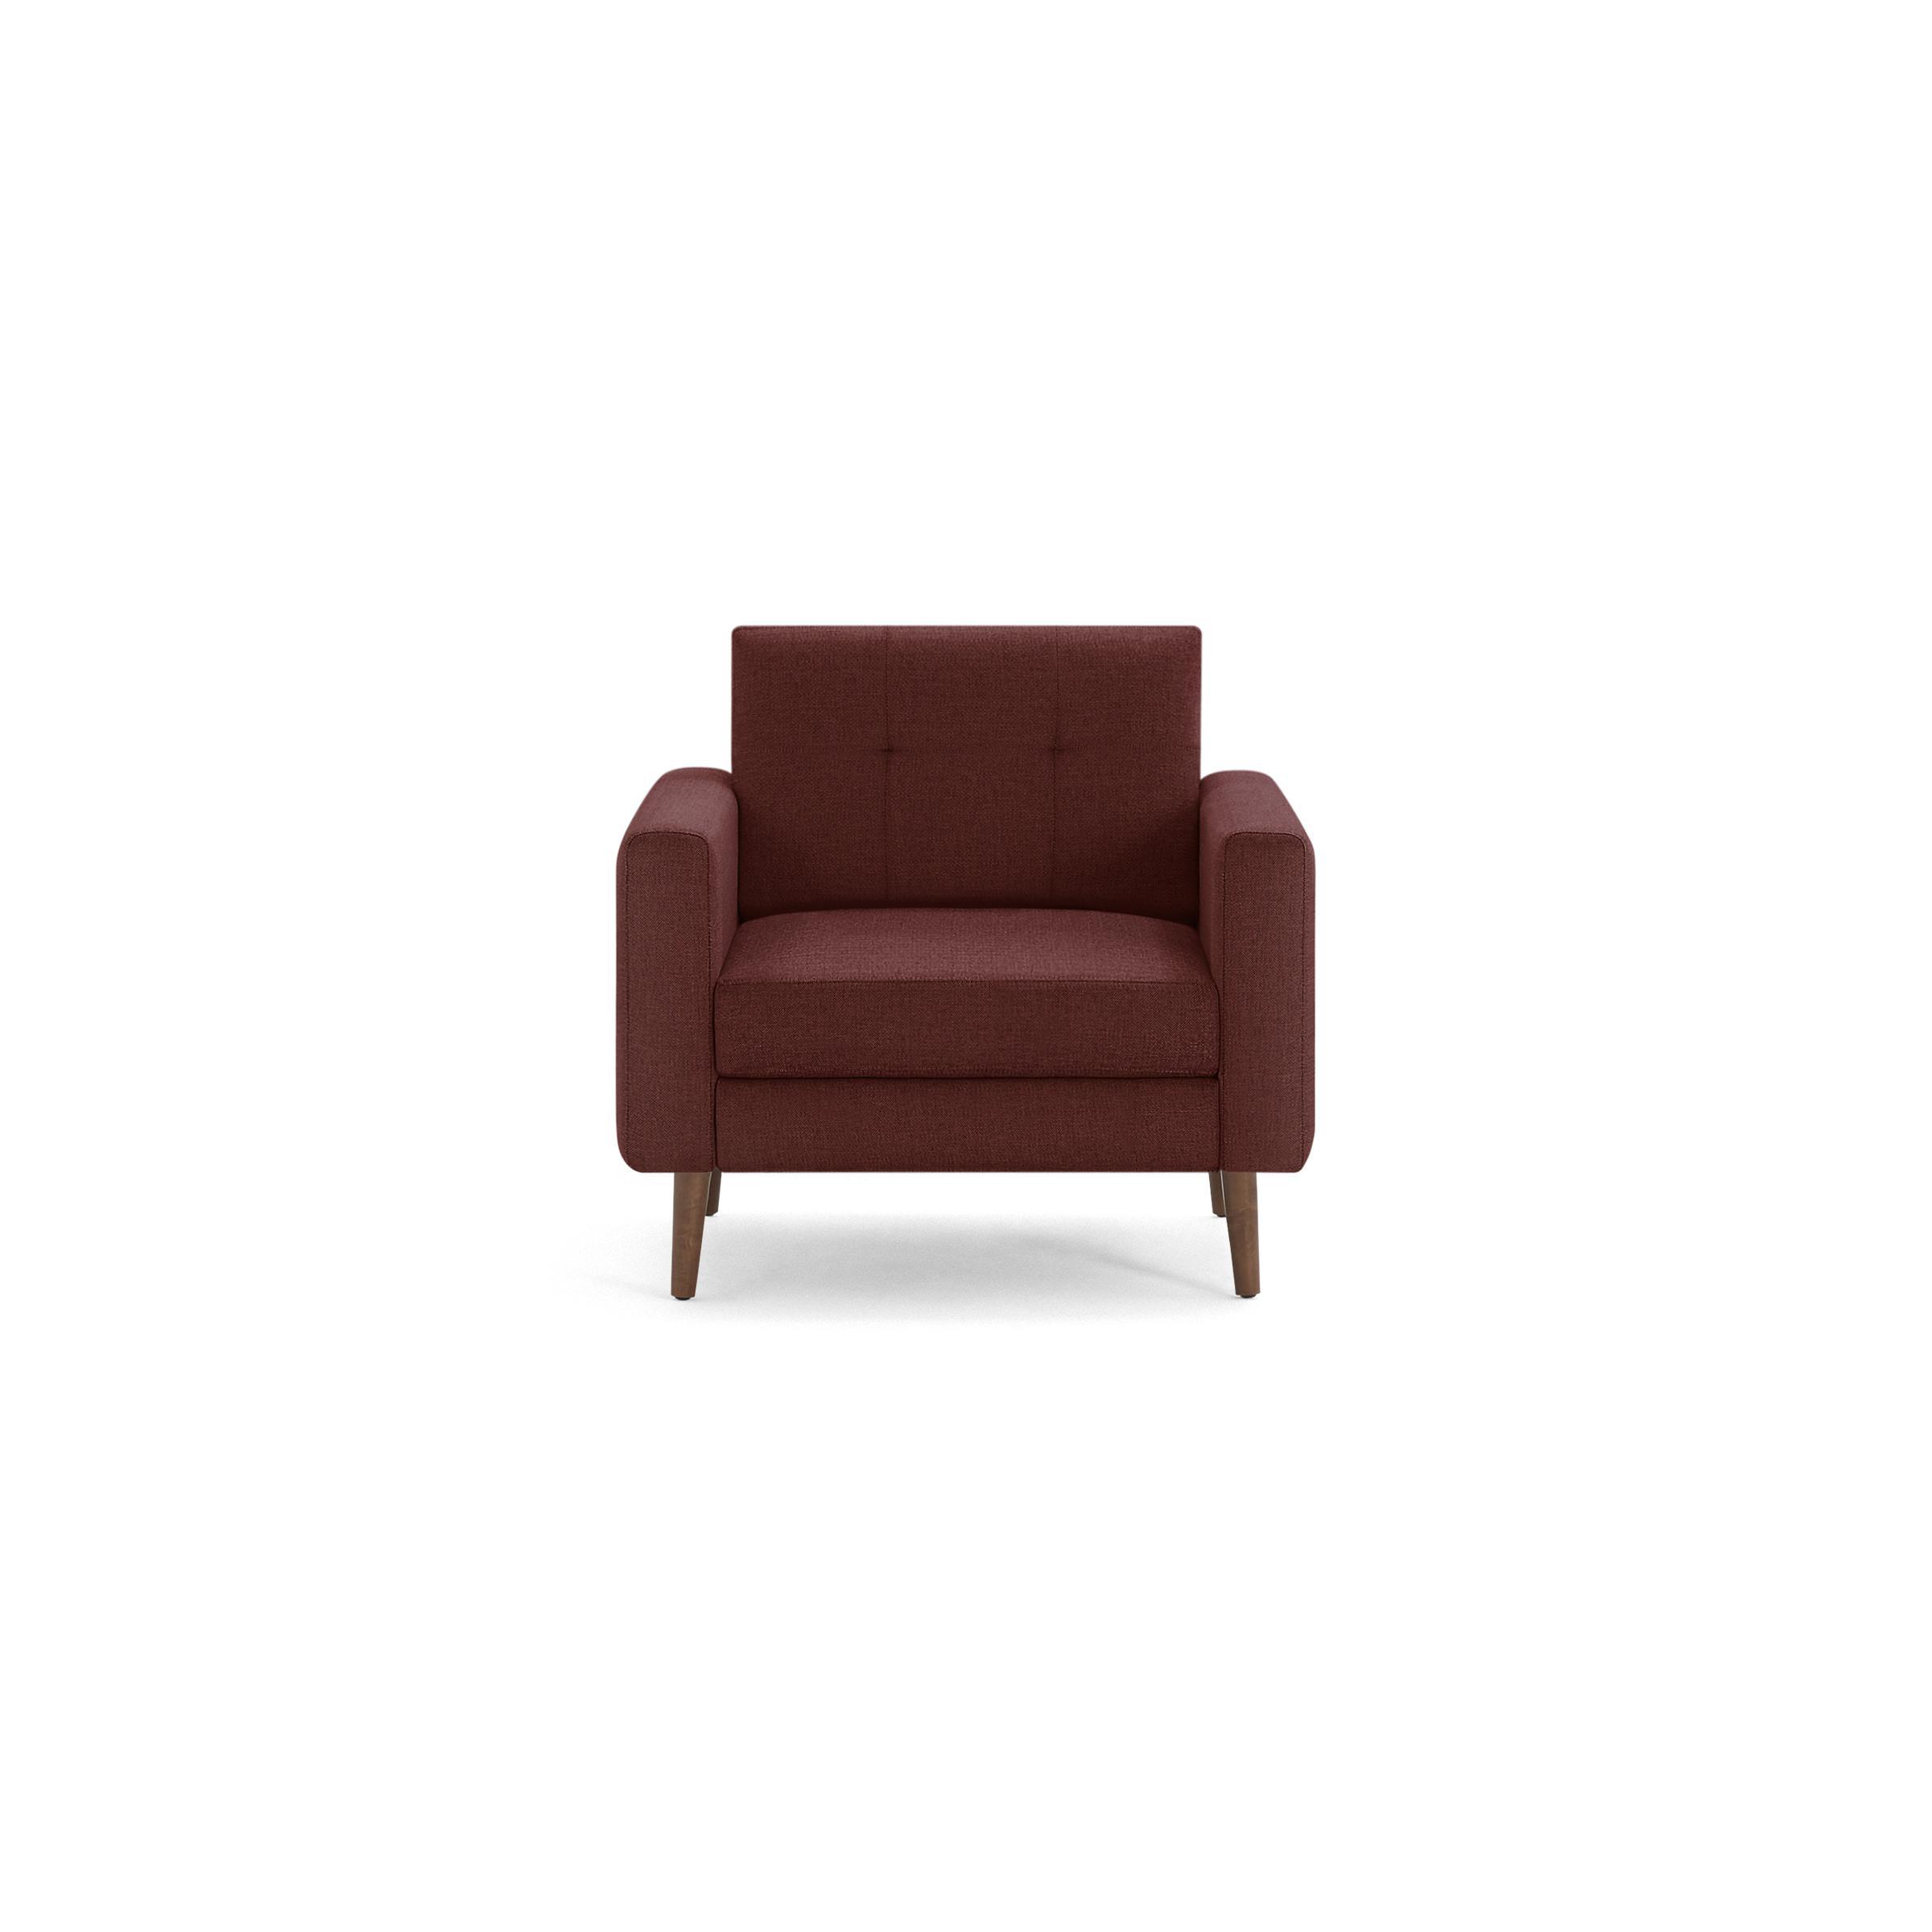 The Block Nomad Armchair in Brick Red, Walnut Legs